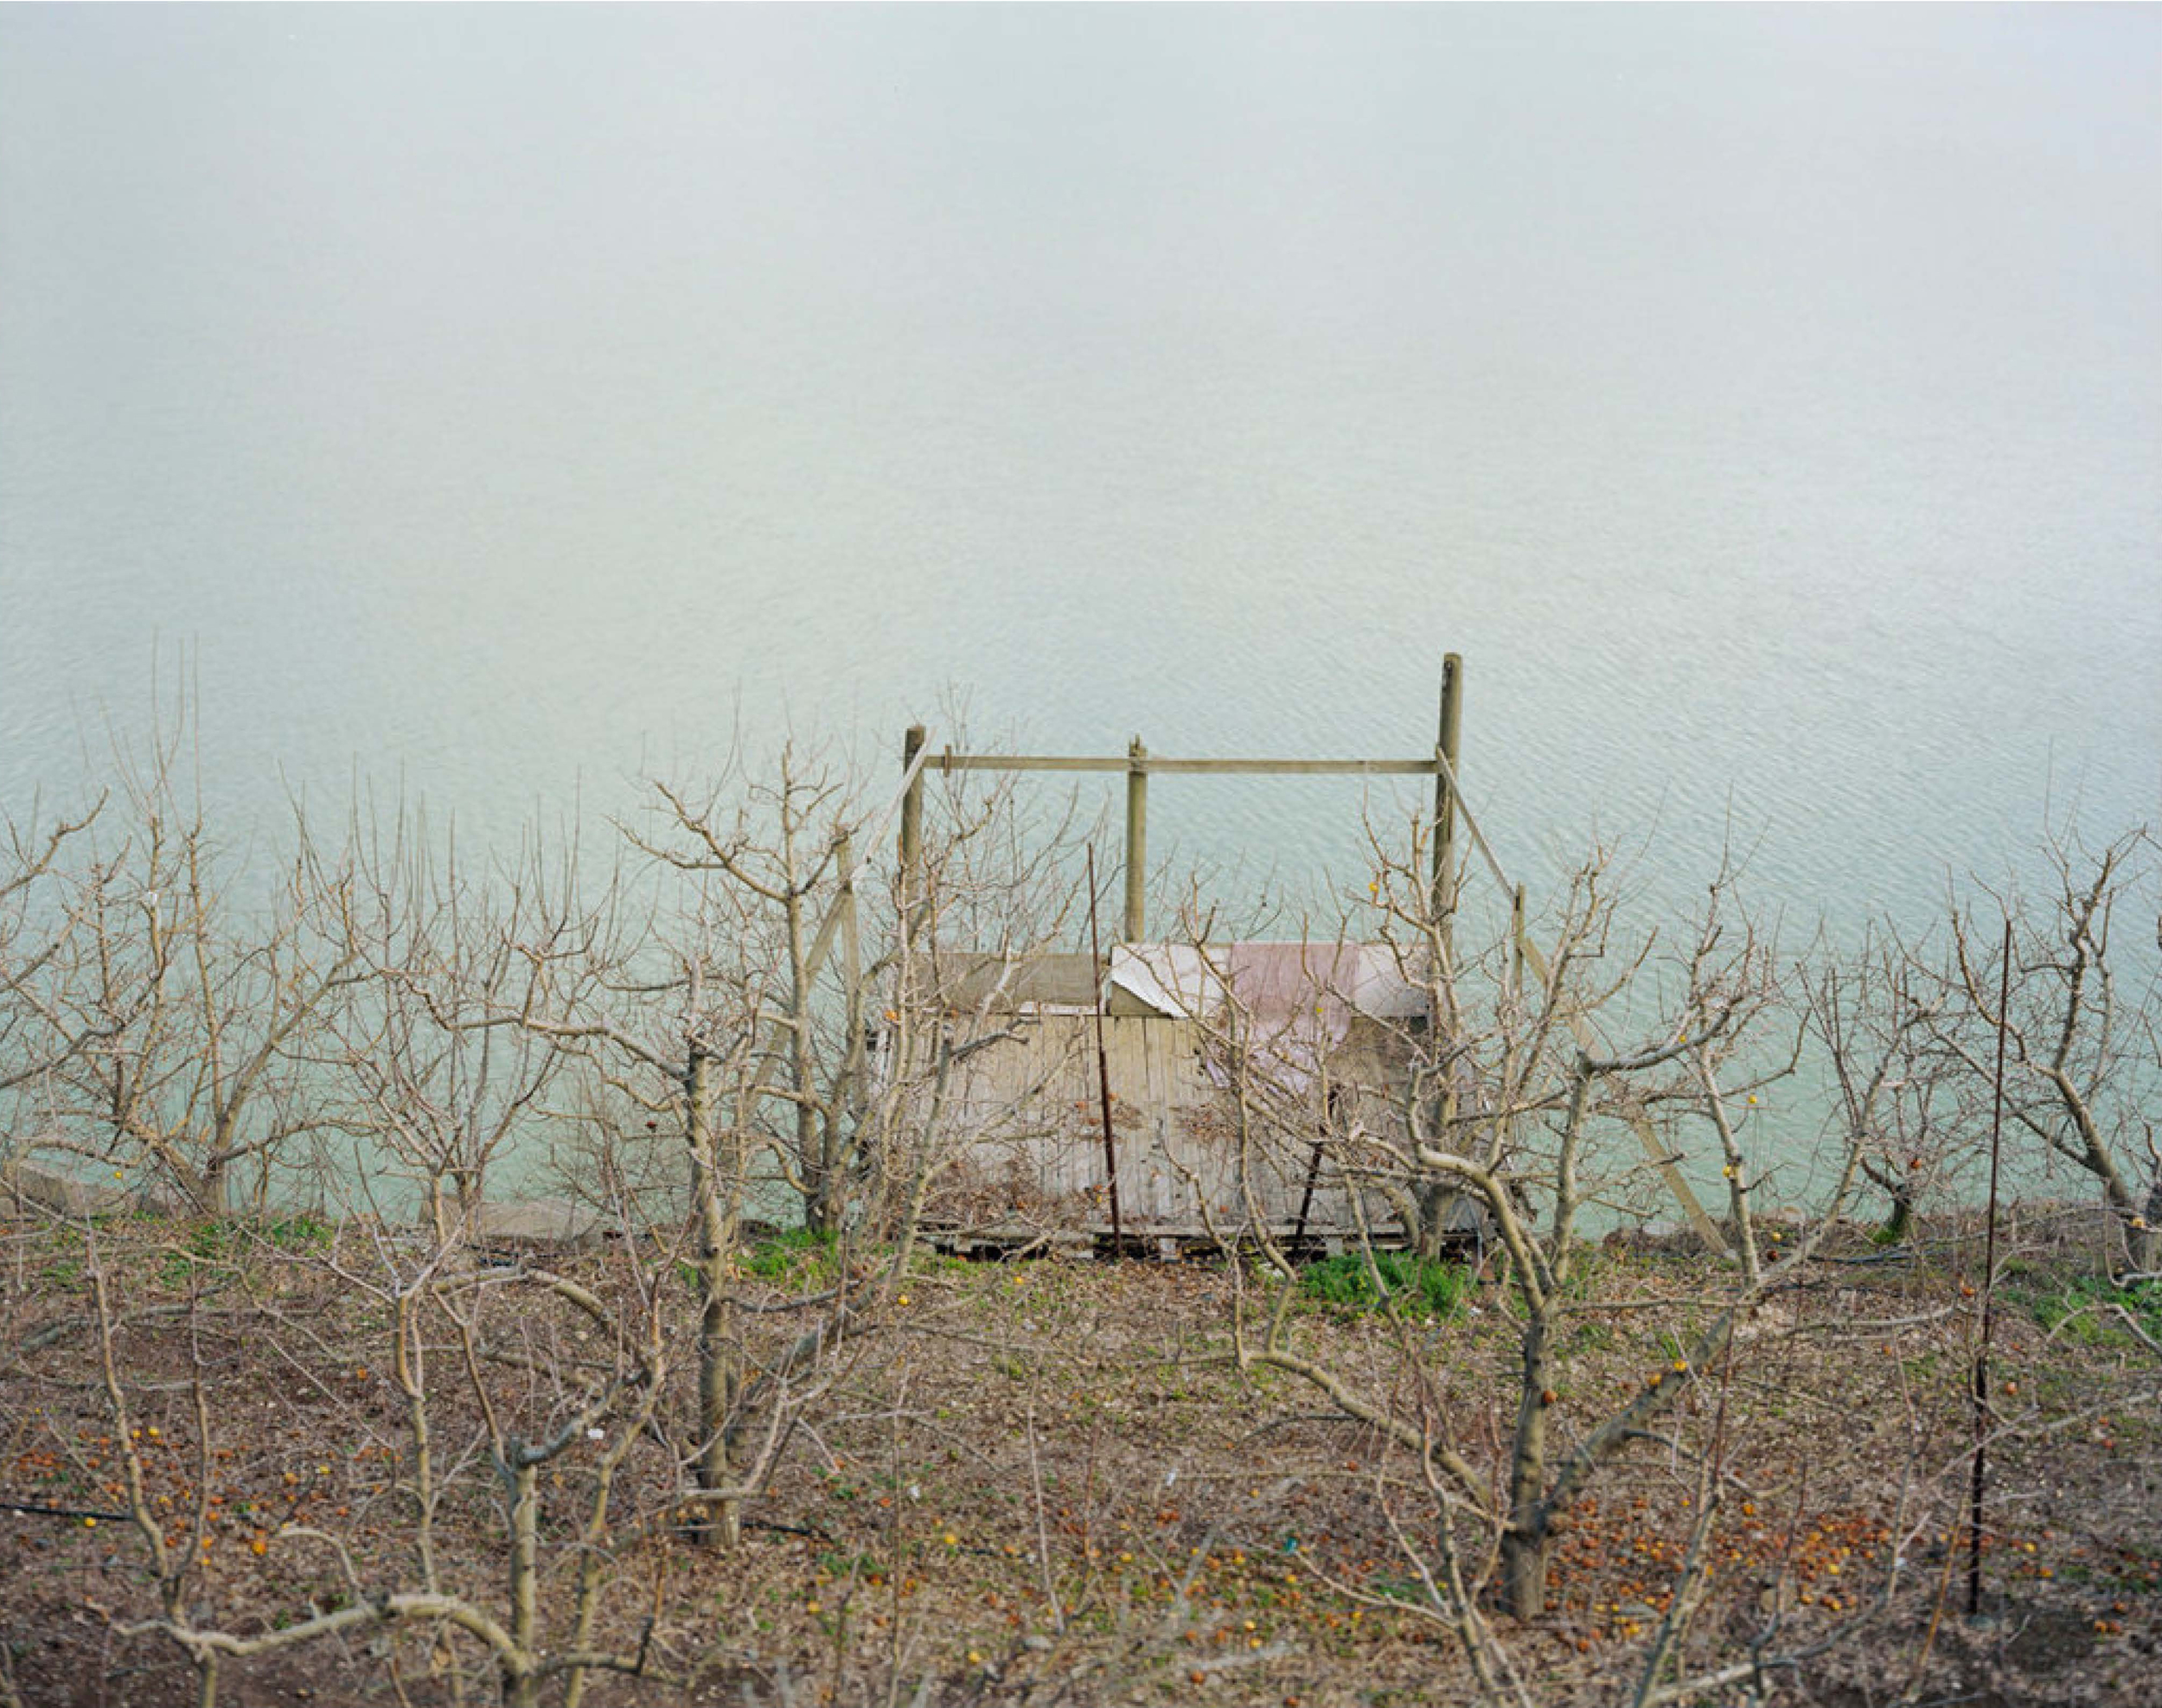 Work by Rea Ben David